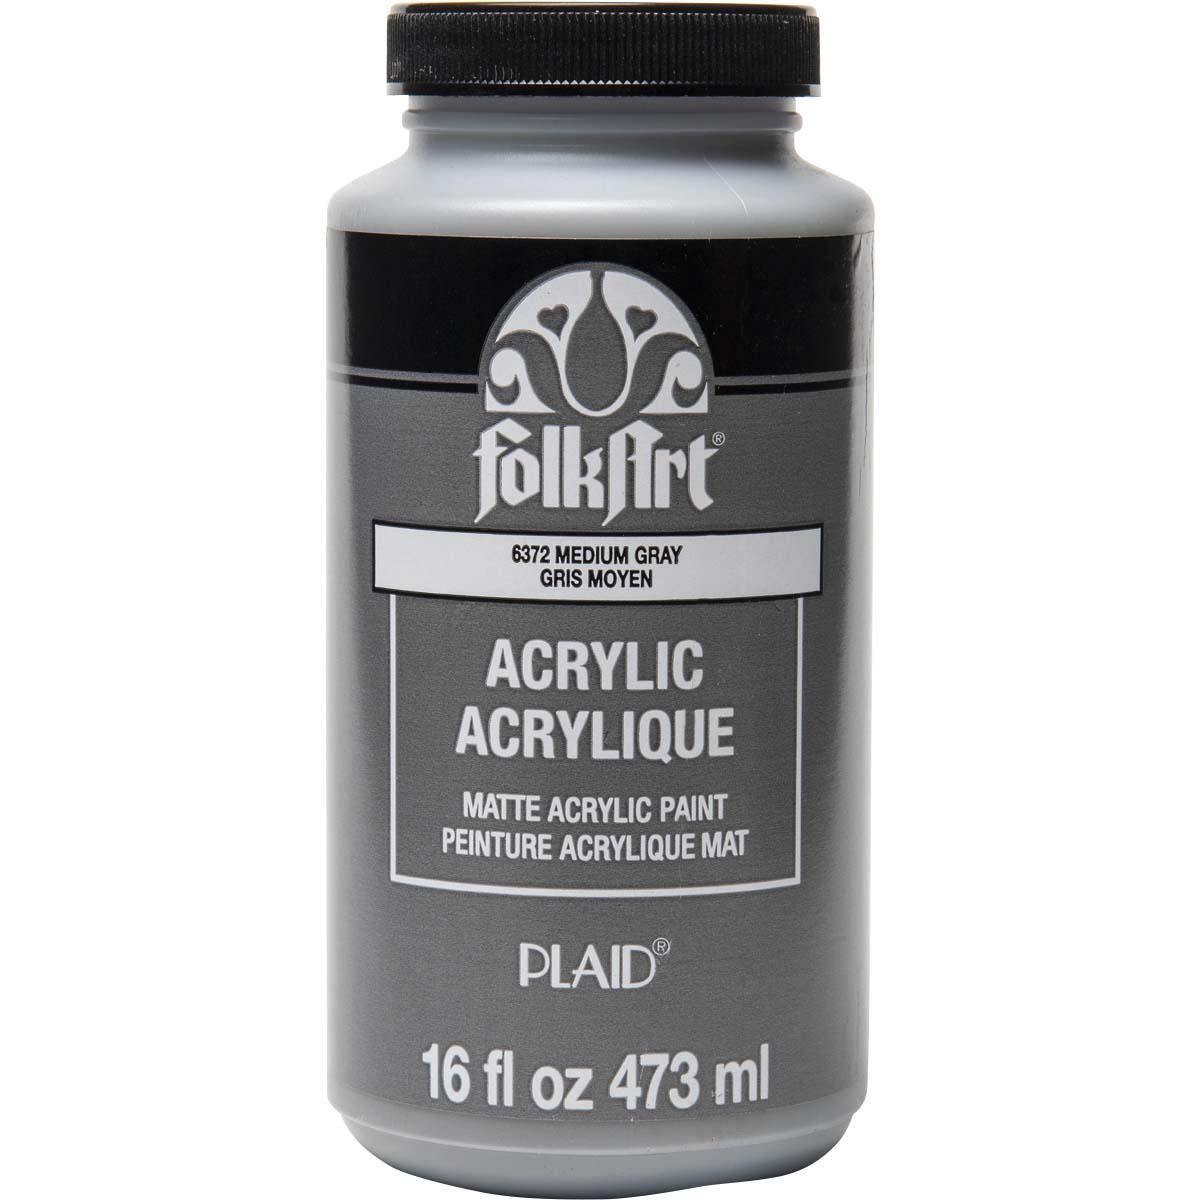 FolkArt ® Acrylic Colors - Medium Gray, 16 oz. - 6372